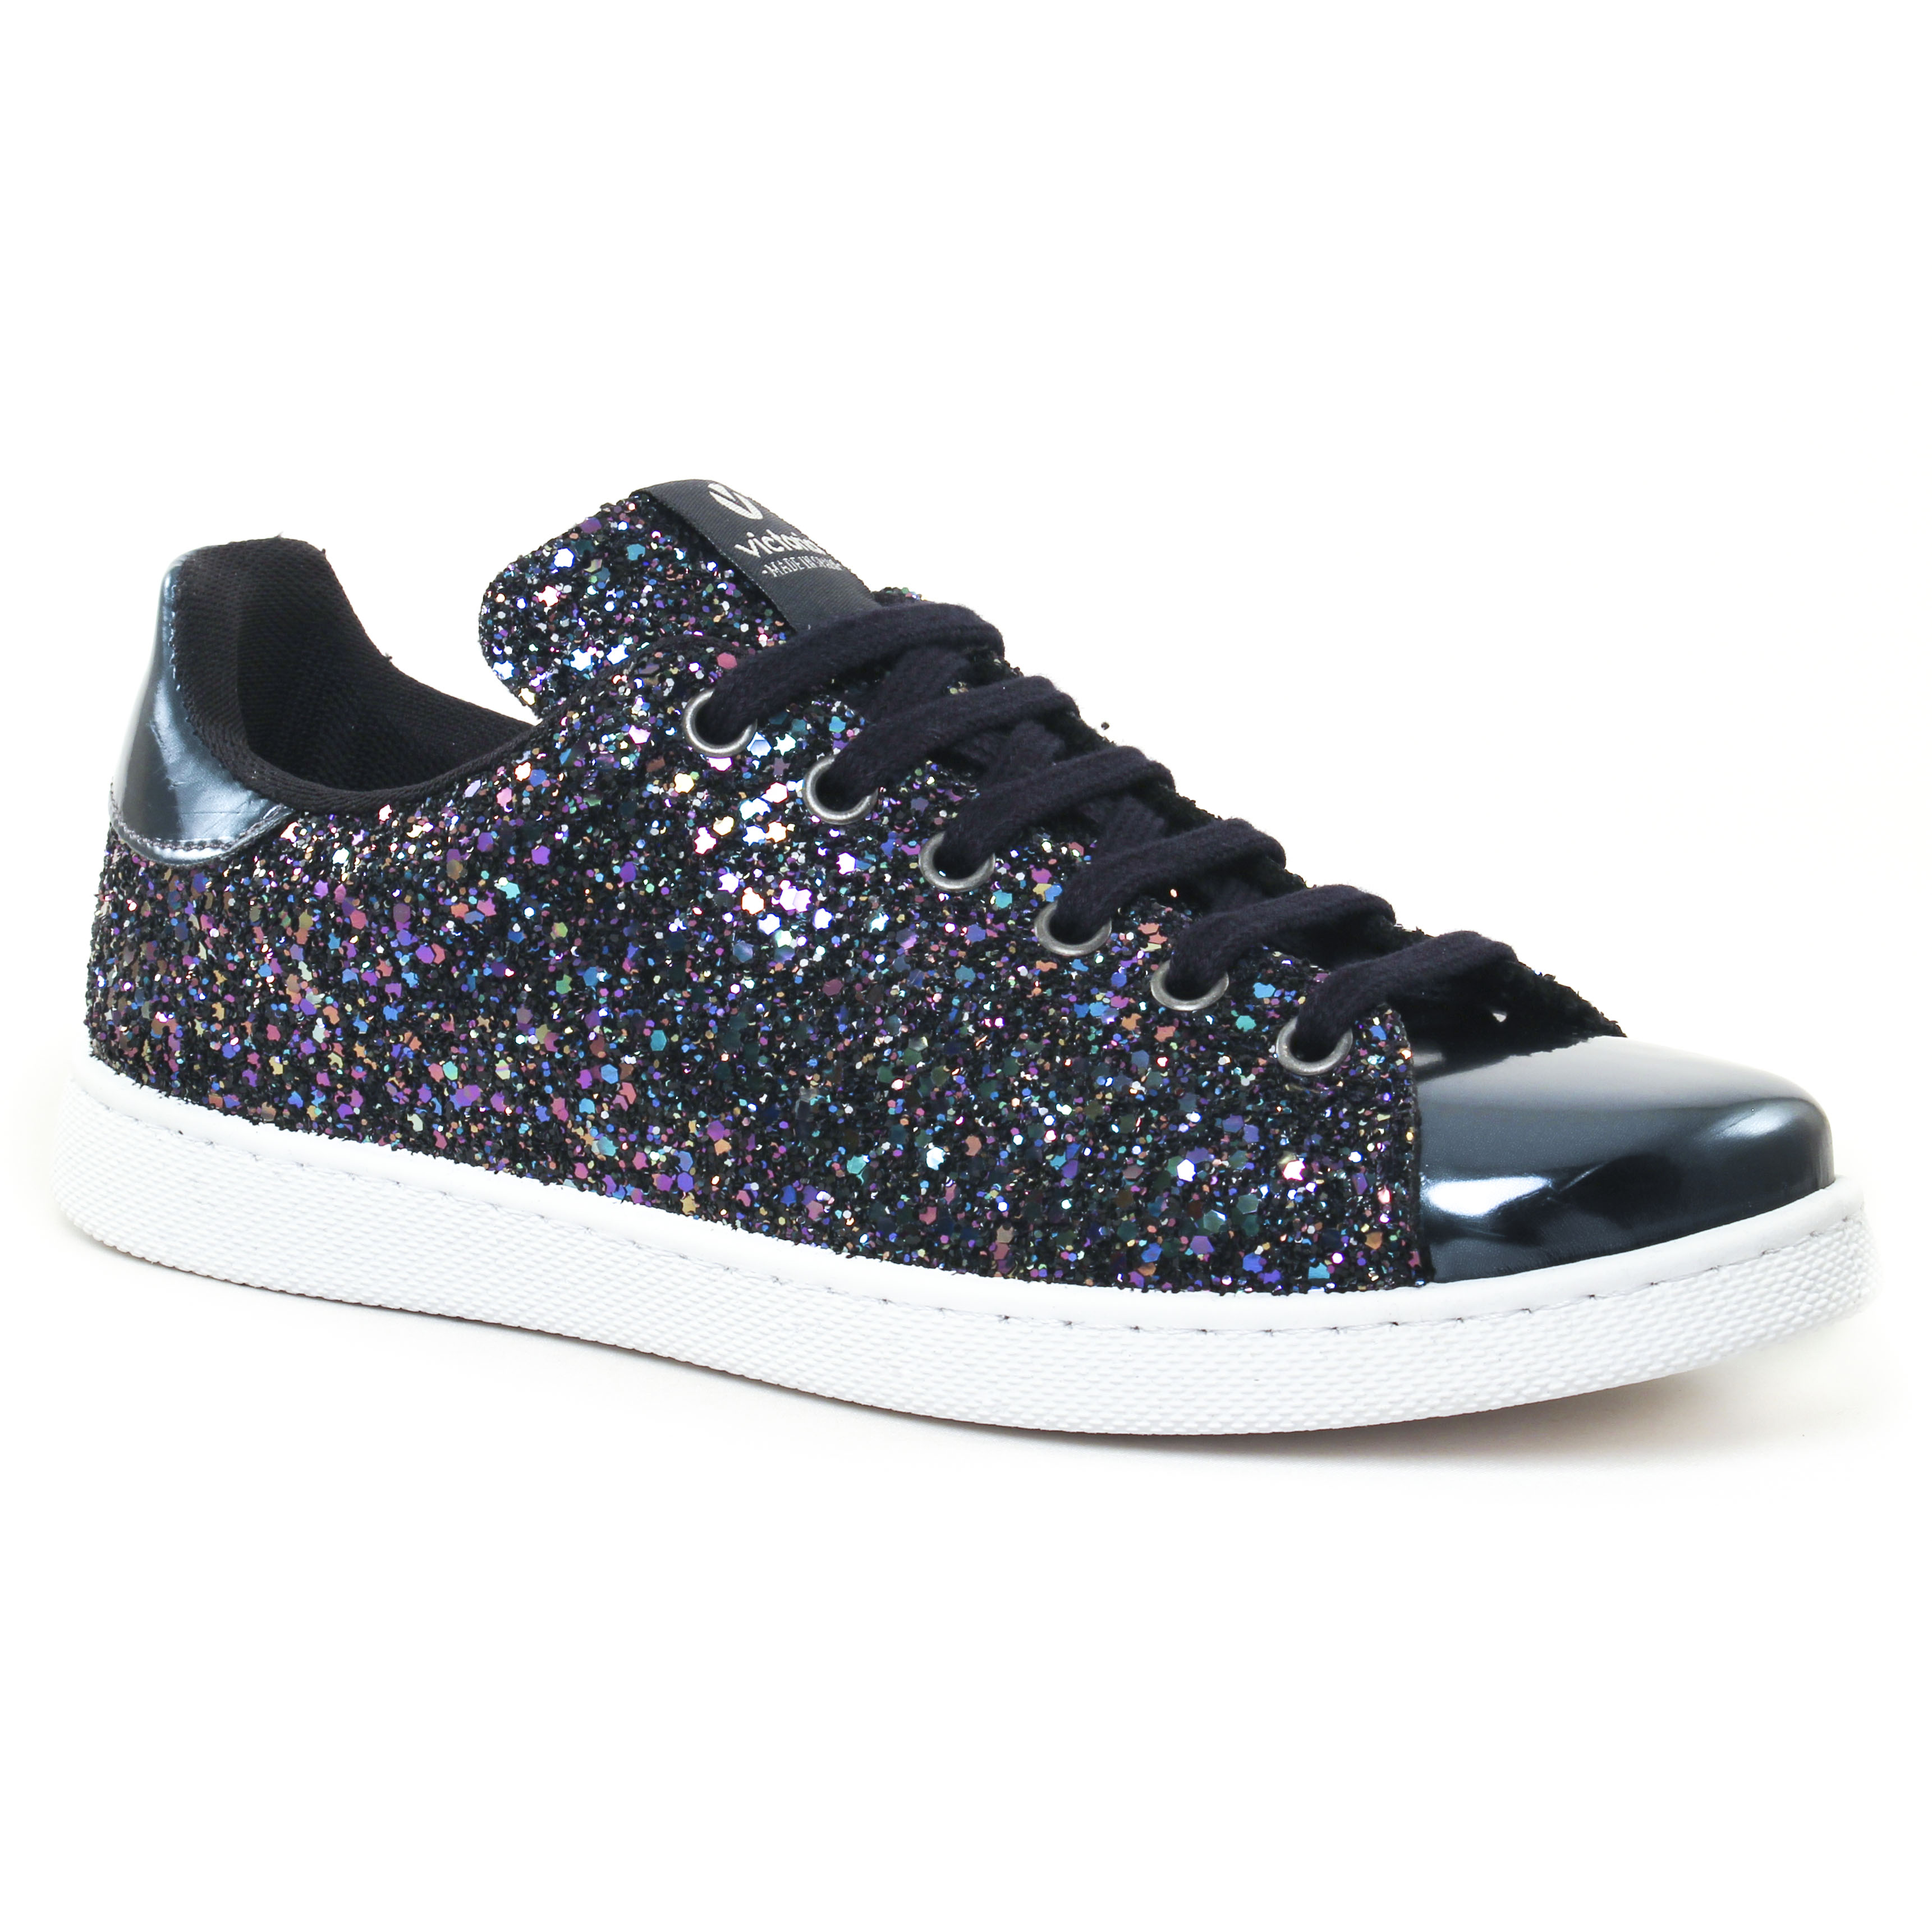 Chaussures Victoria noires Fashion homme JPGOJKbB